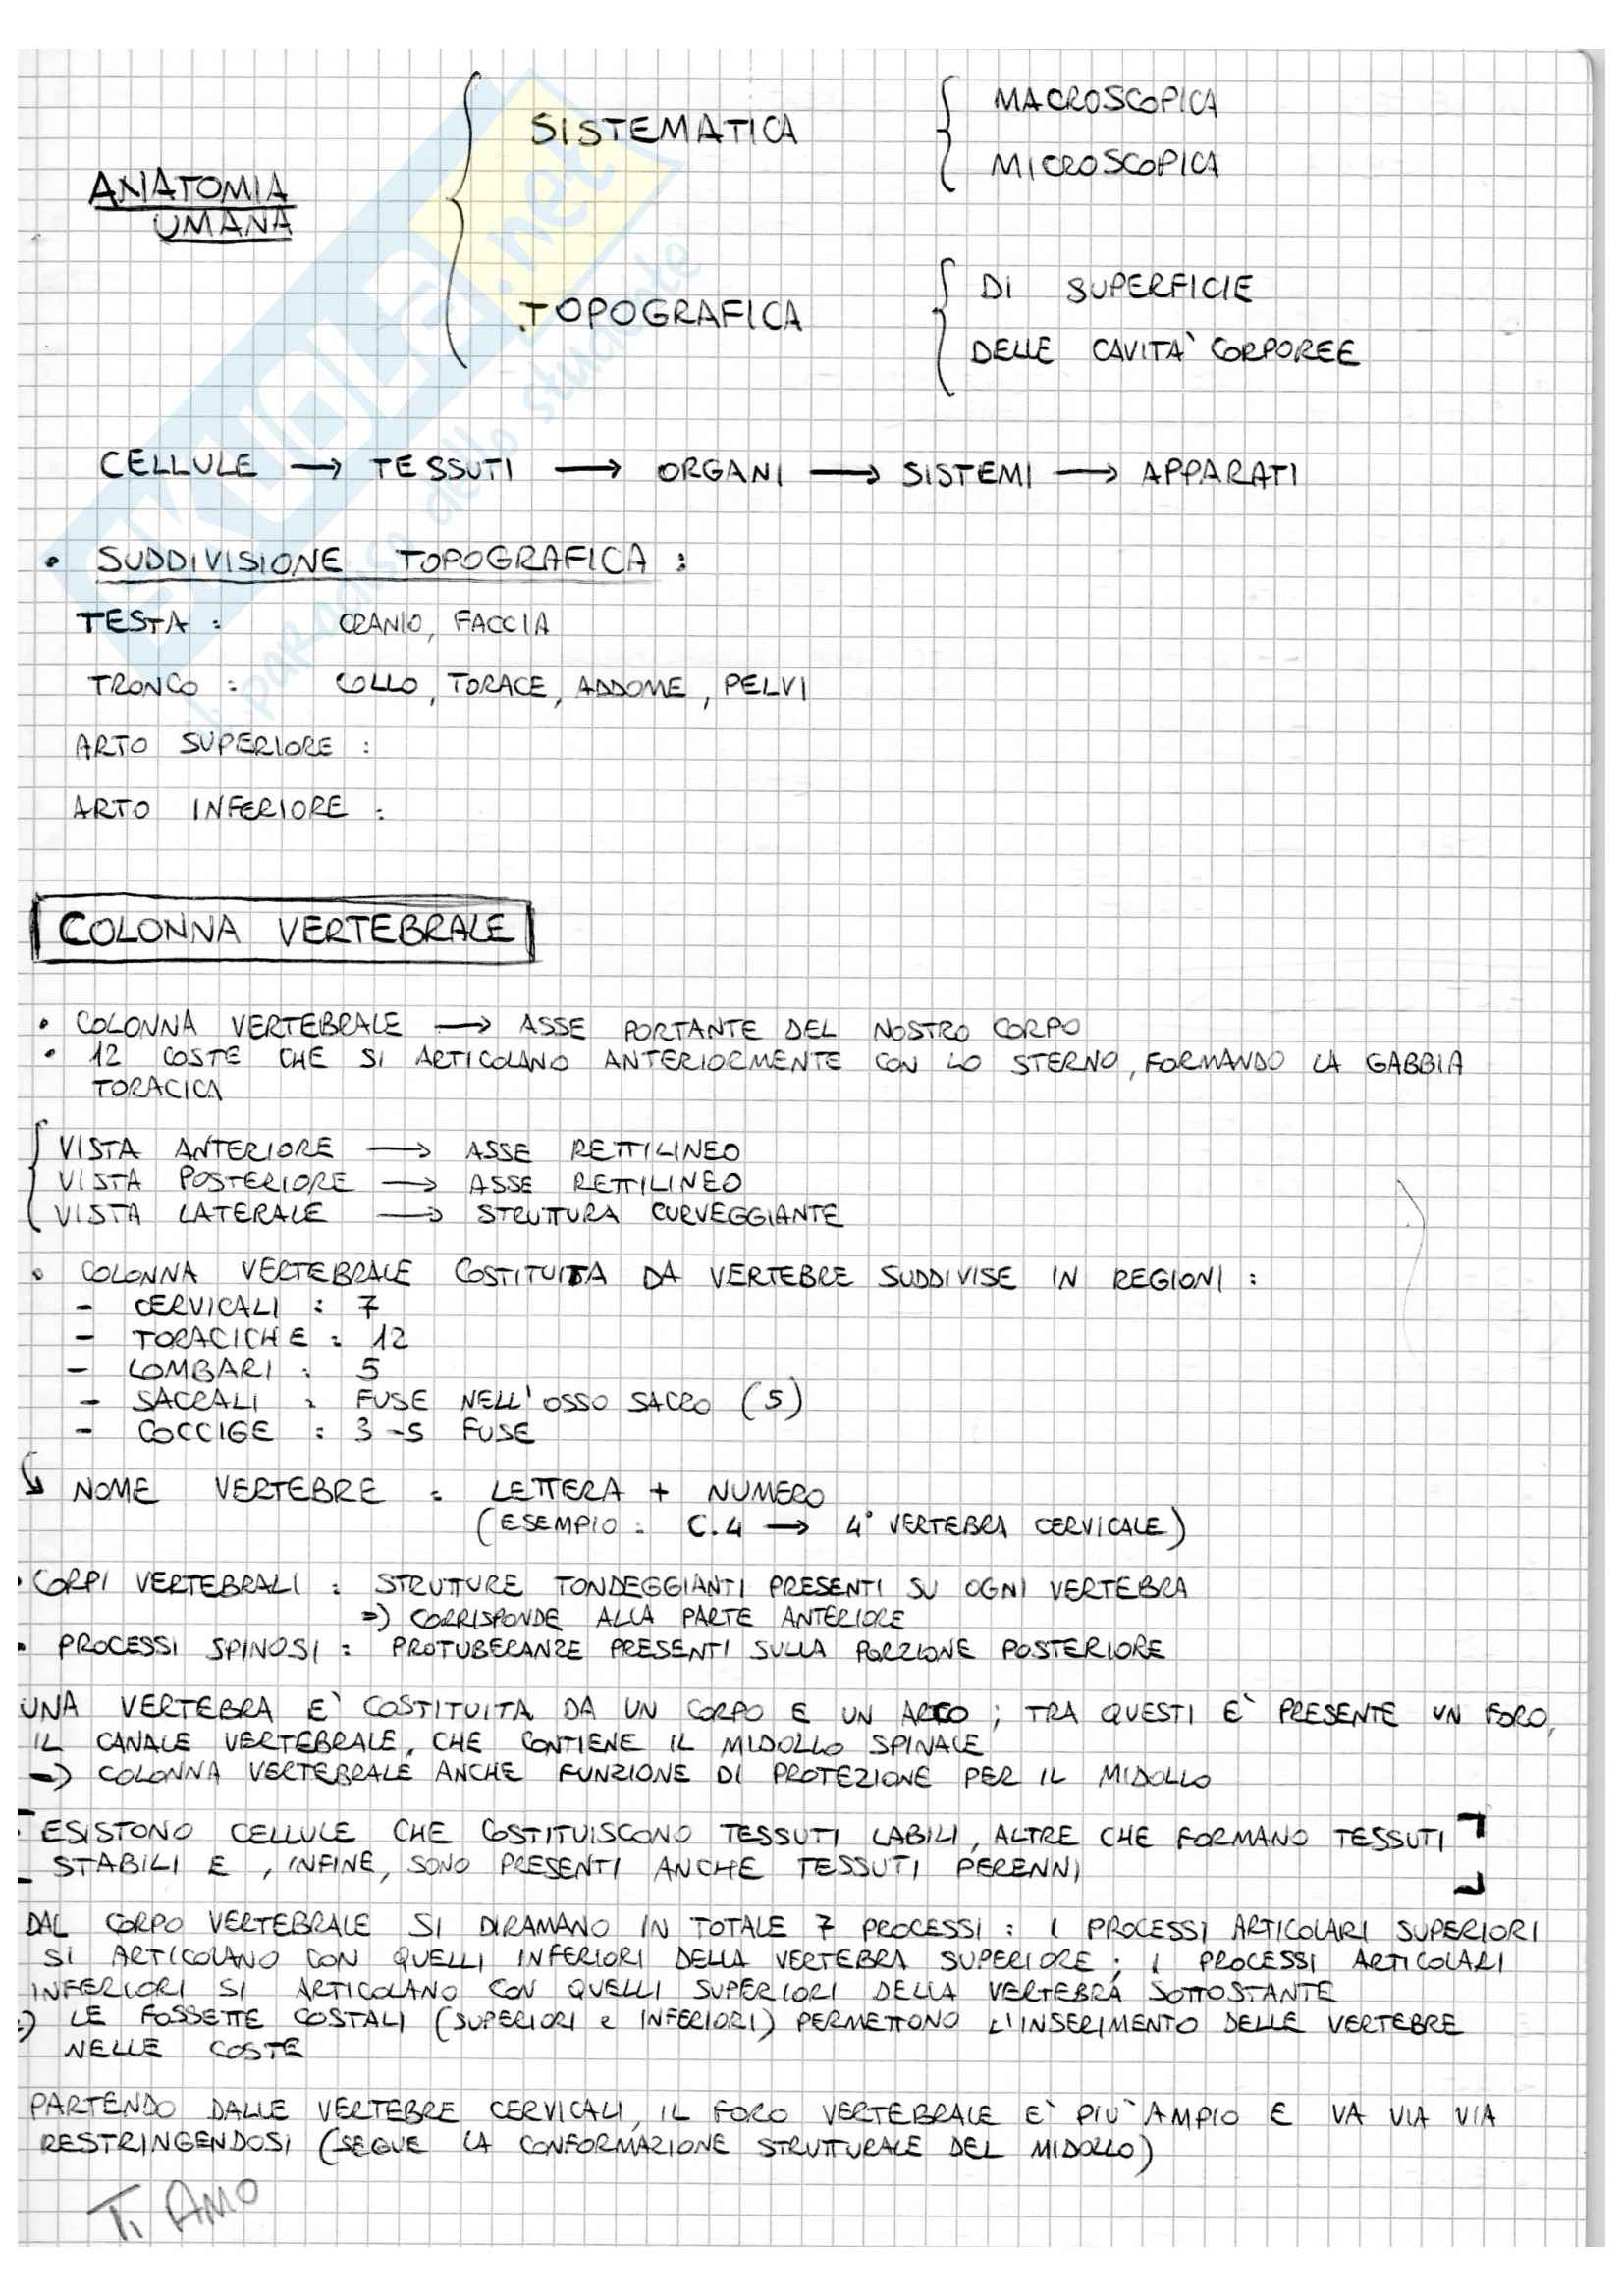 Anatomia generale - Appunti